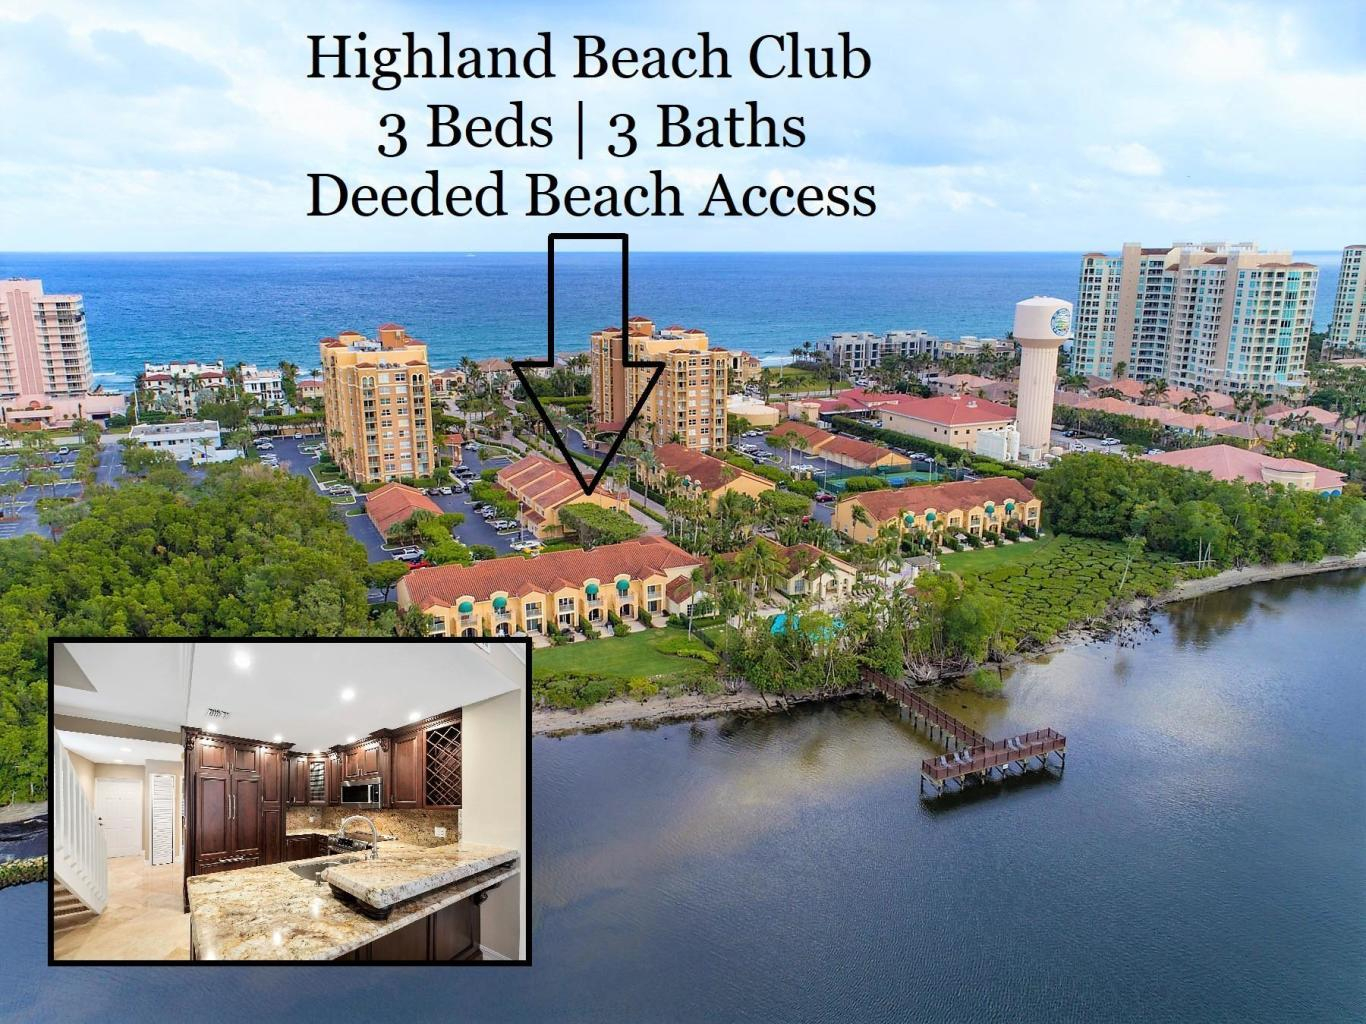 3596 S Ocean Blvd #108, Highland Beach, Fl 33487 - Mls Rx - Highland Beach Florida Map